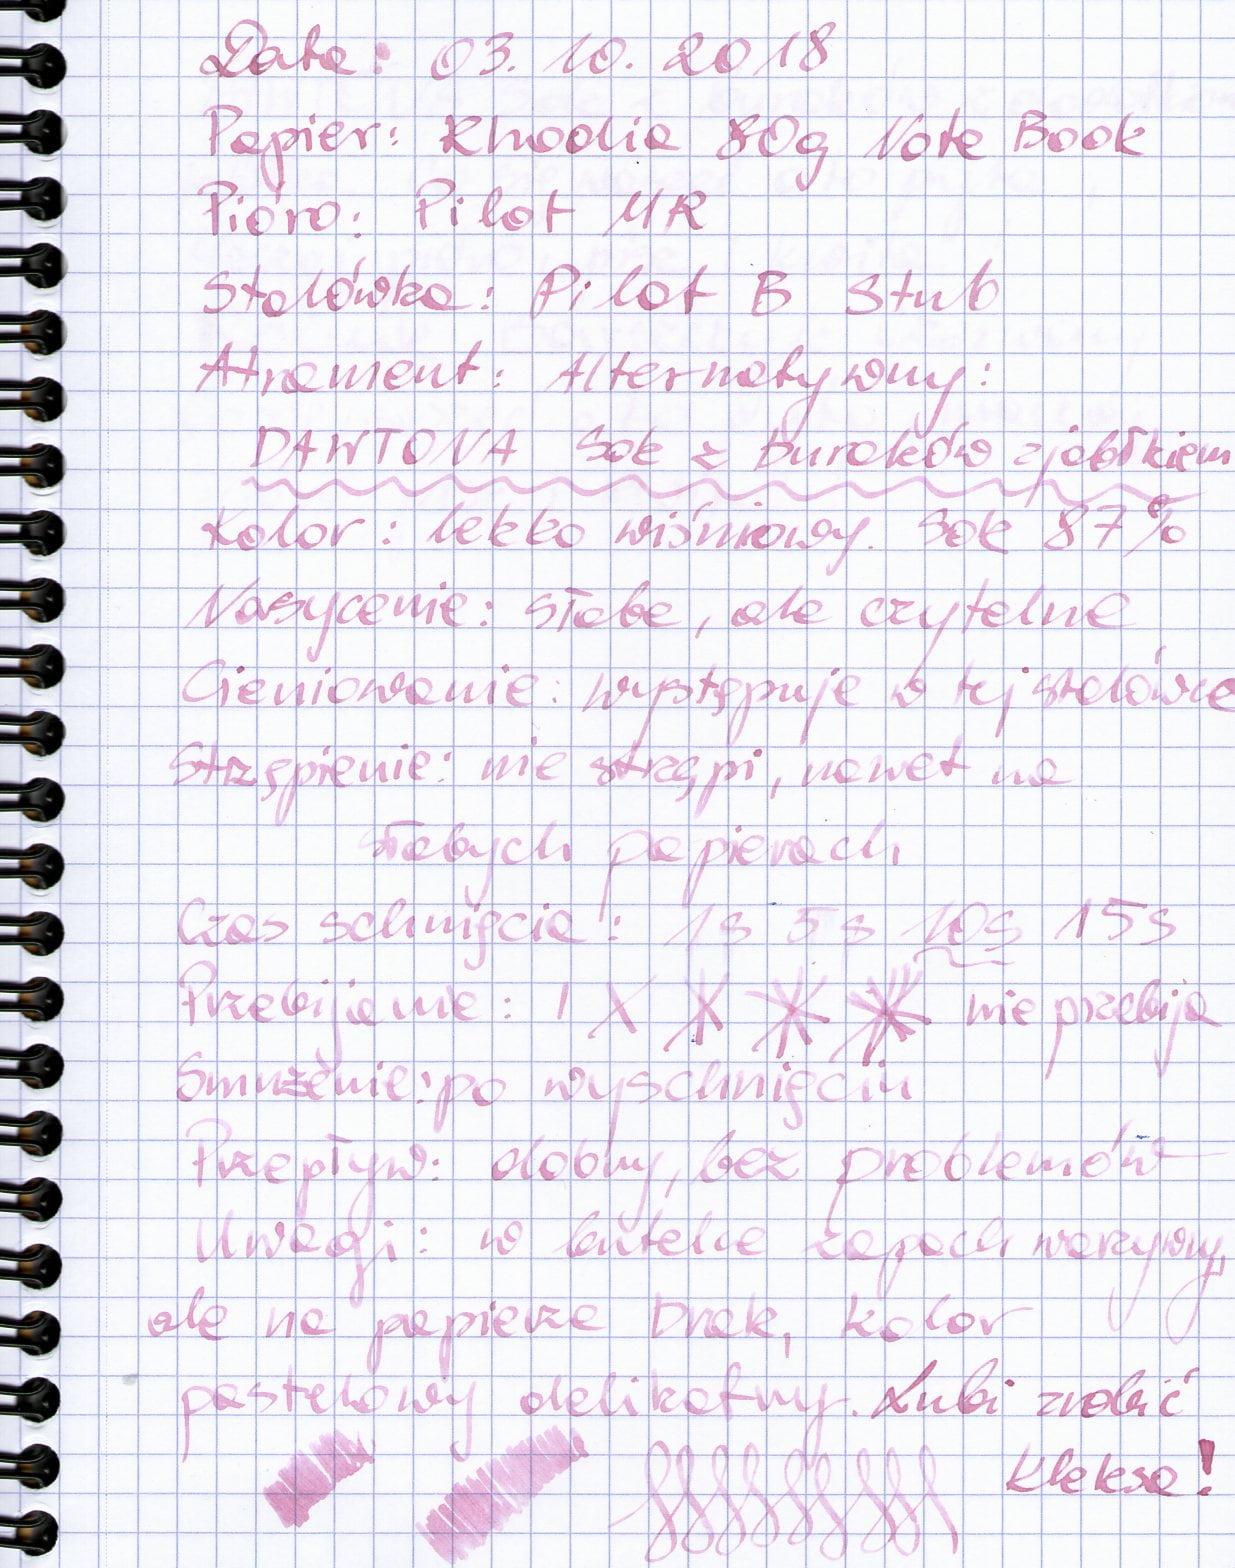 3ec7bcd4be032dc5.jpg